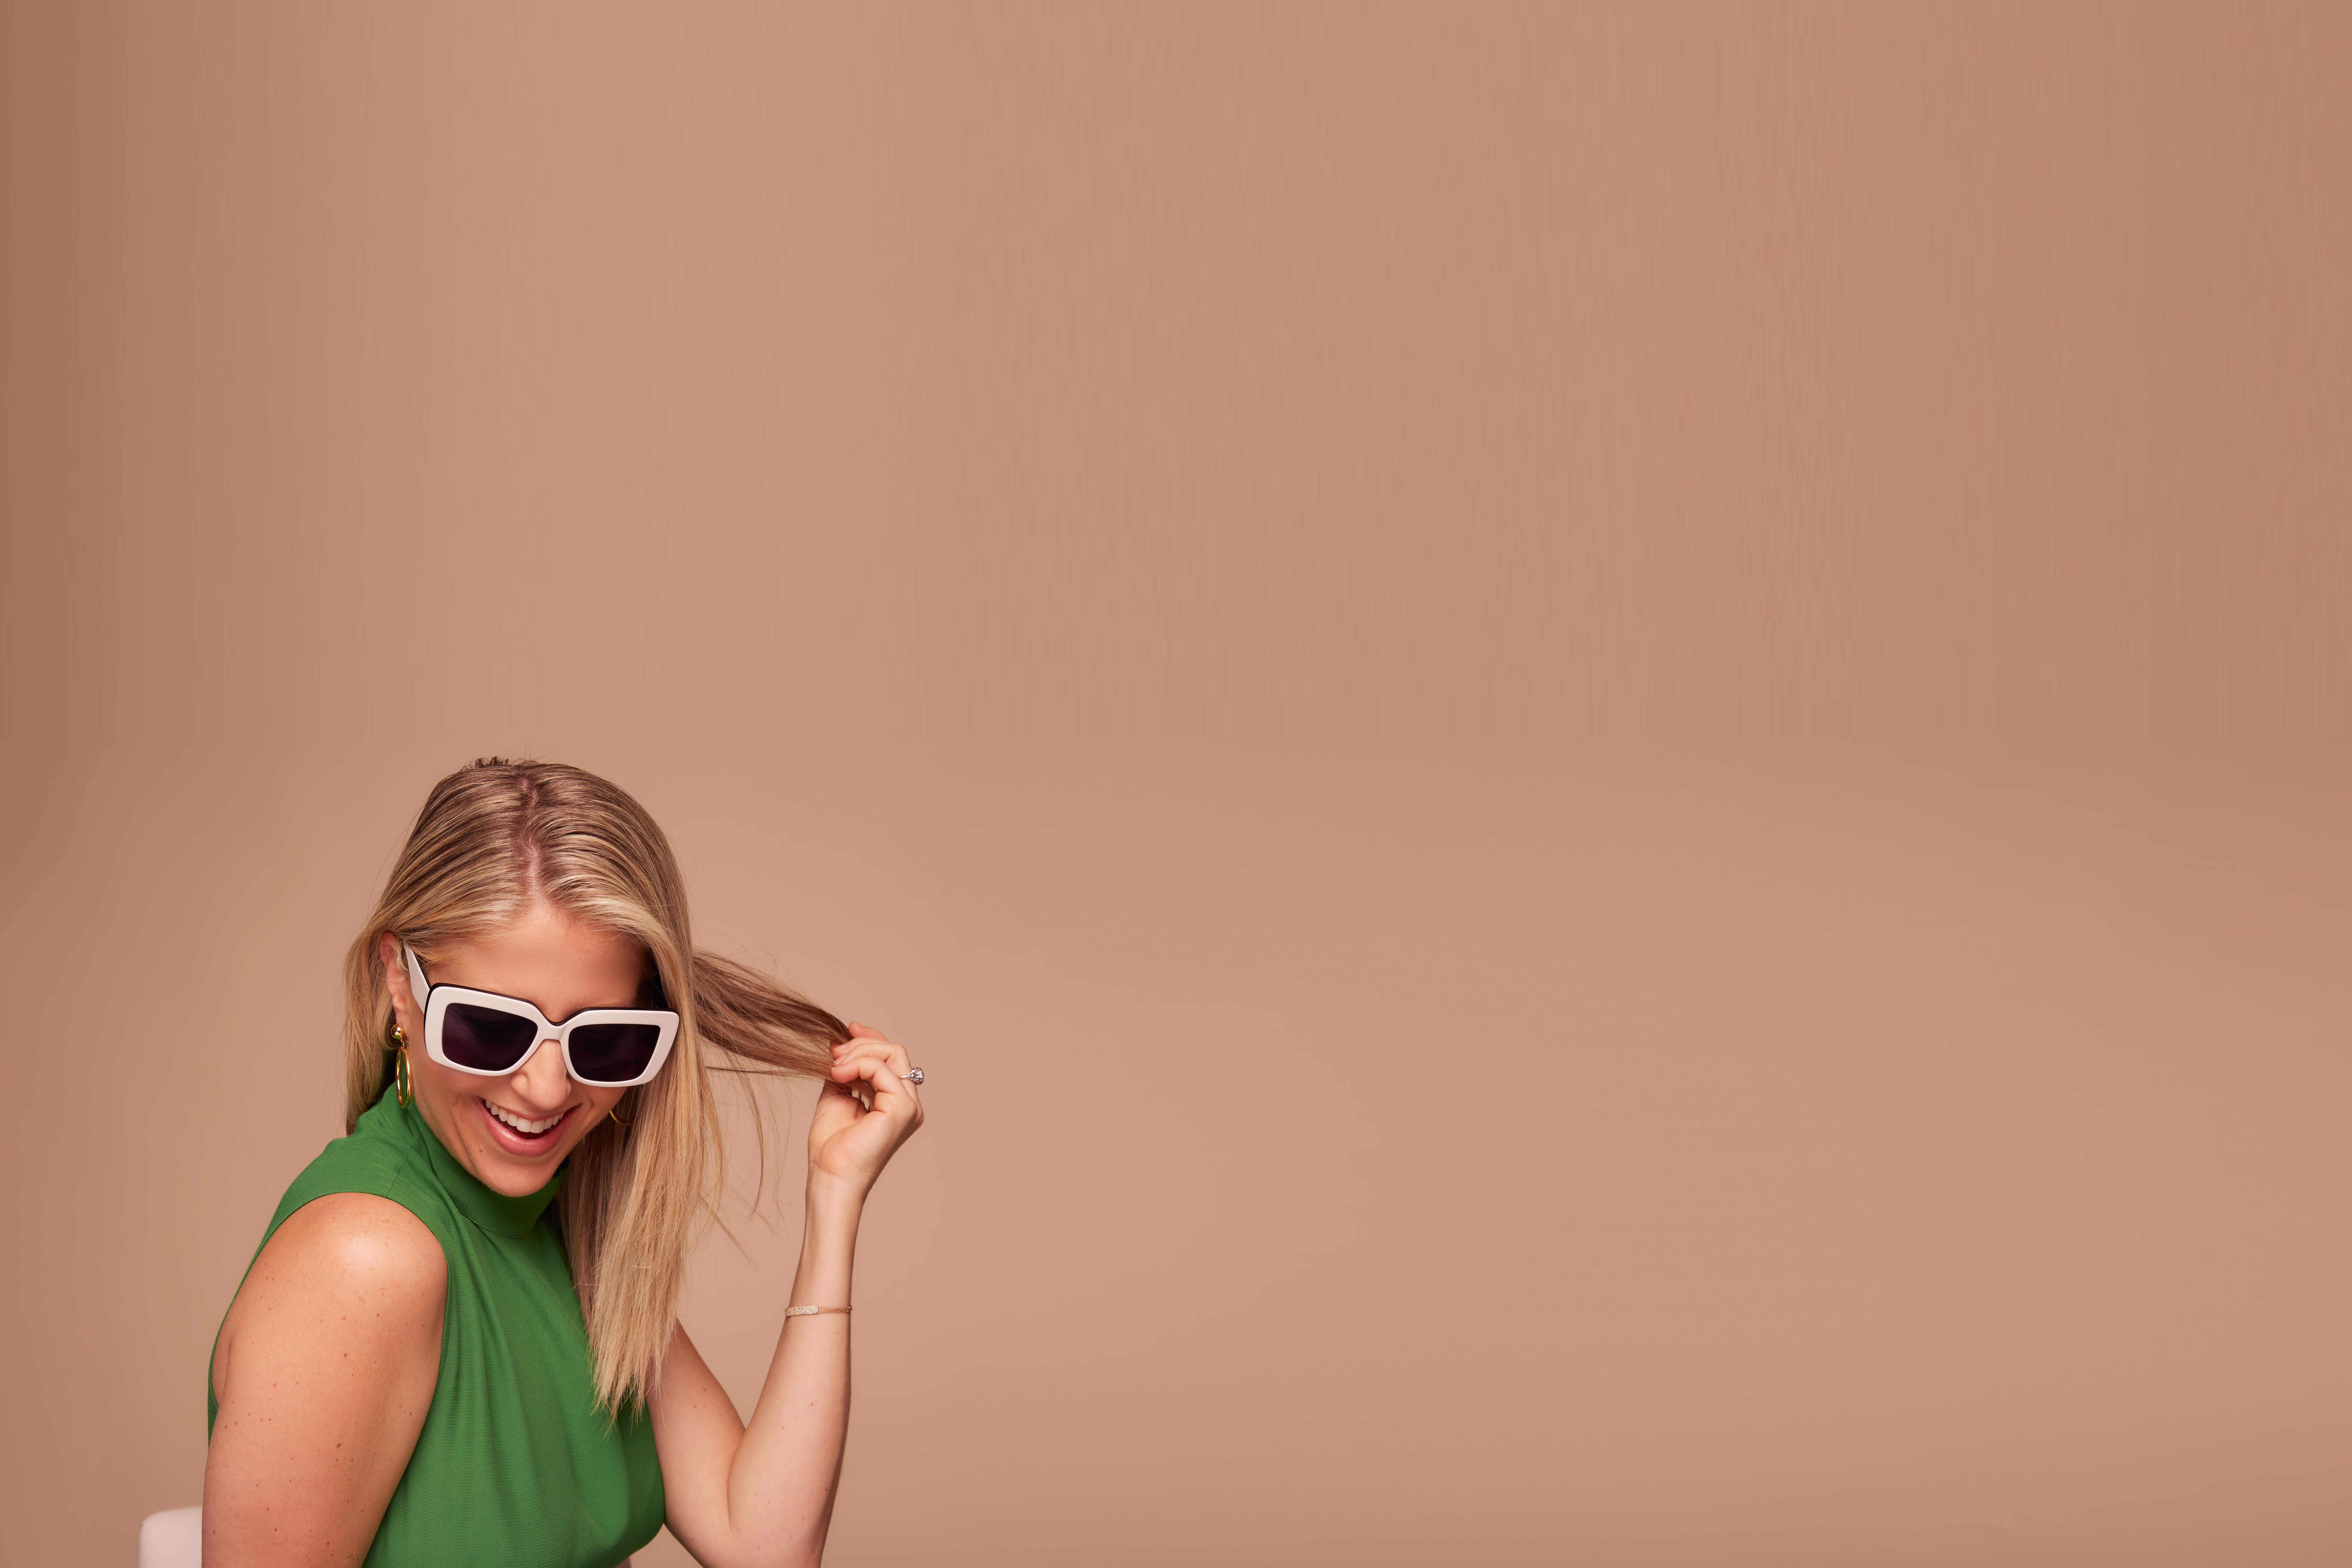 ff230c1f30 Best Sunglasses For Summer Festivals 2018